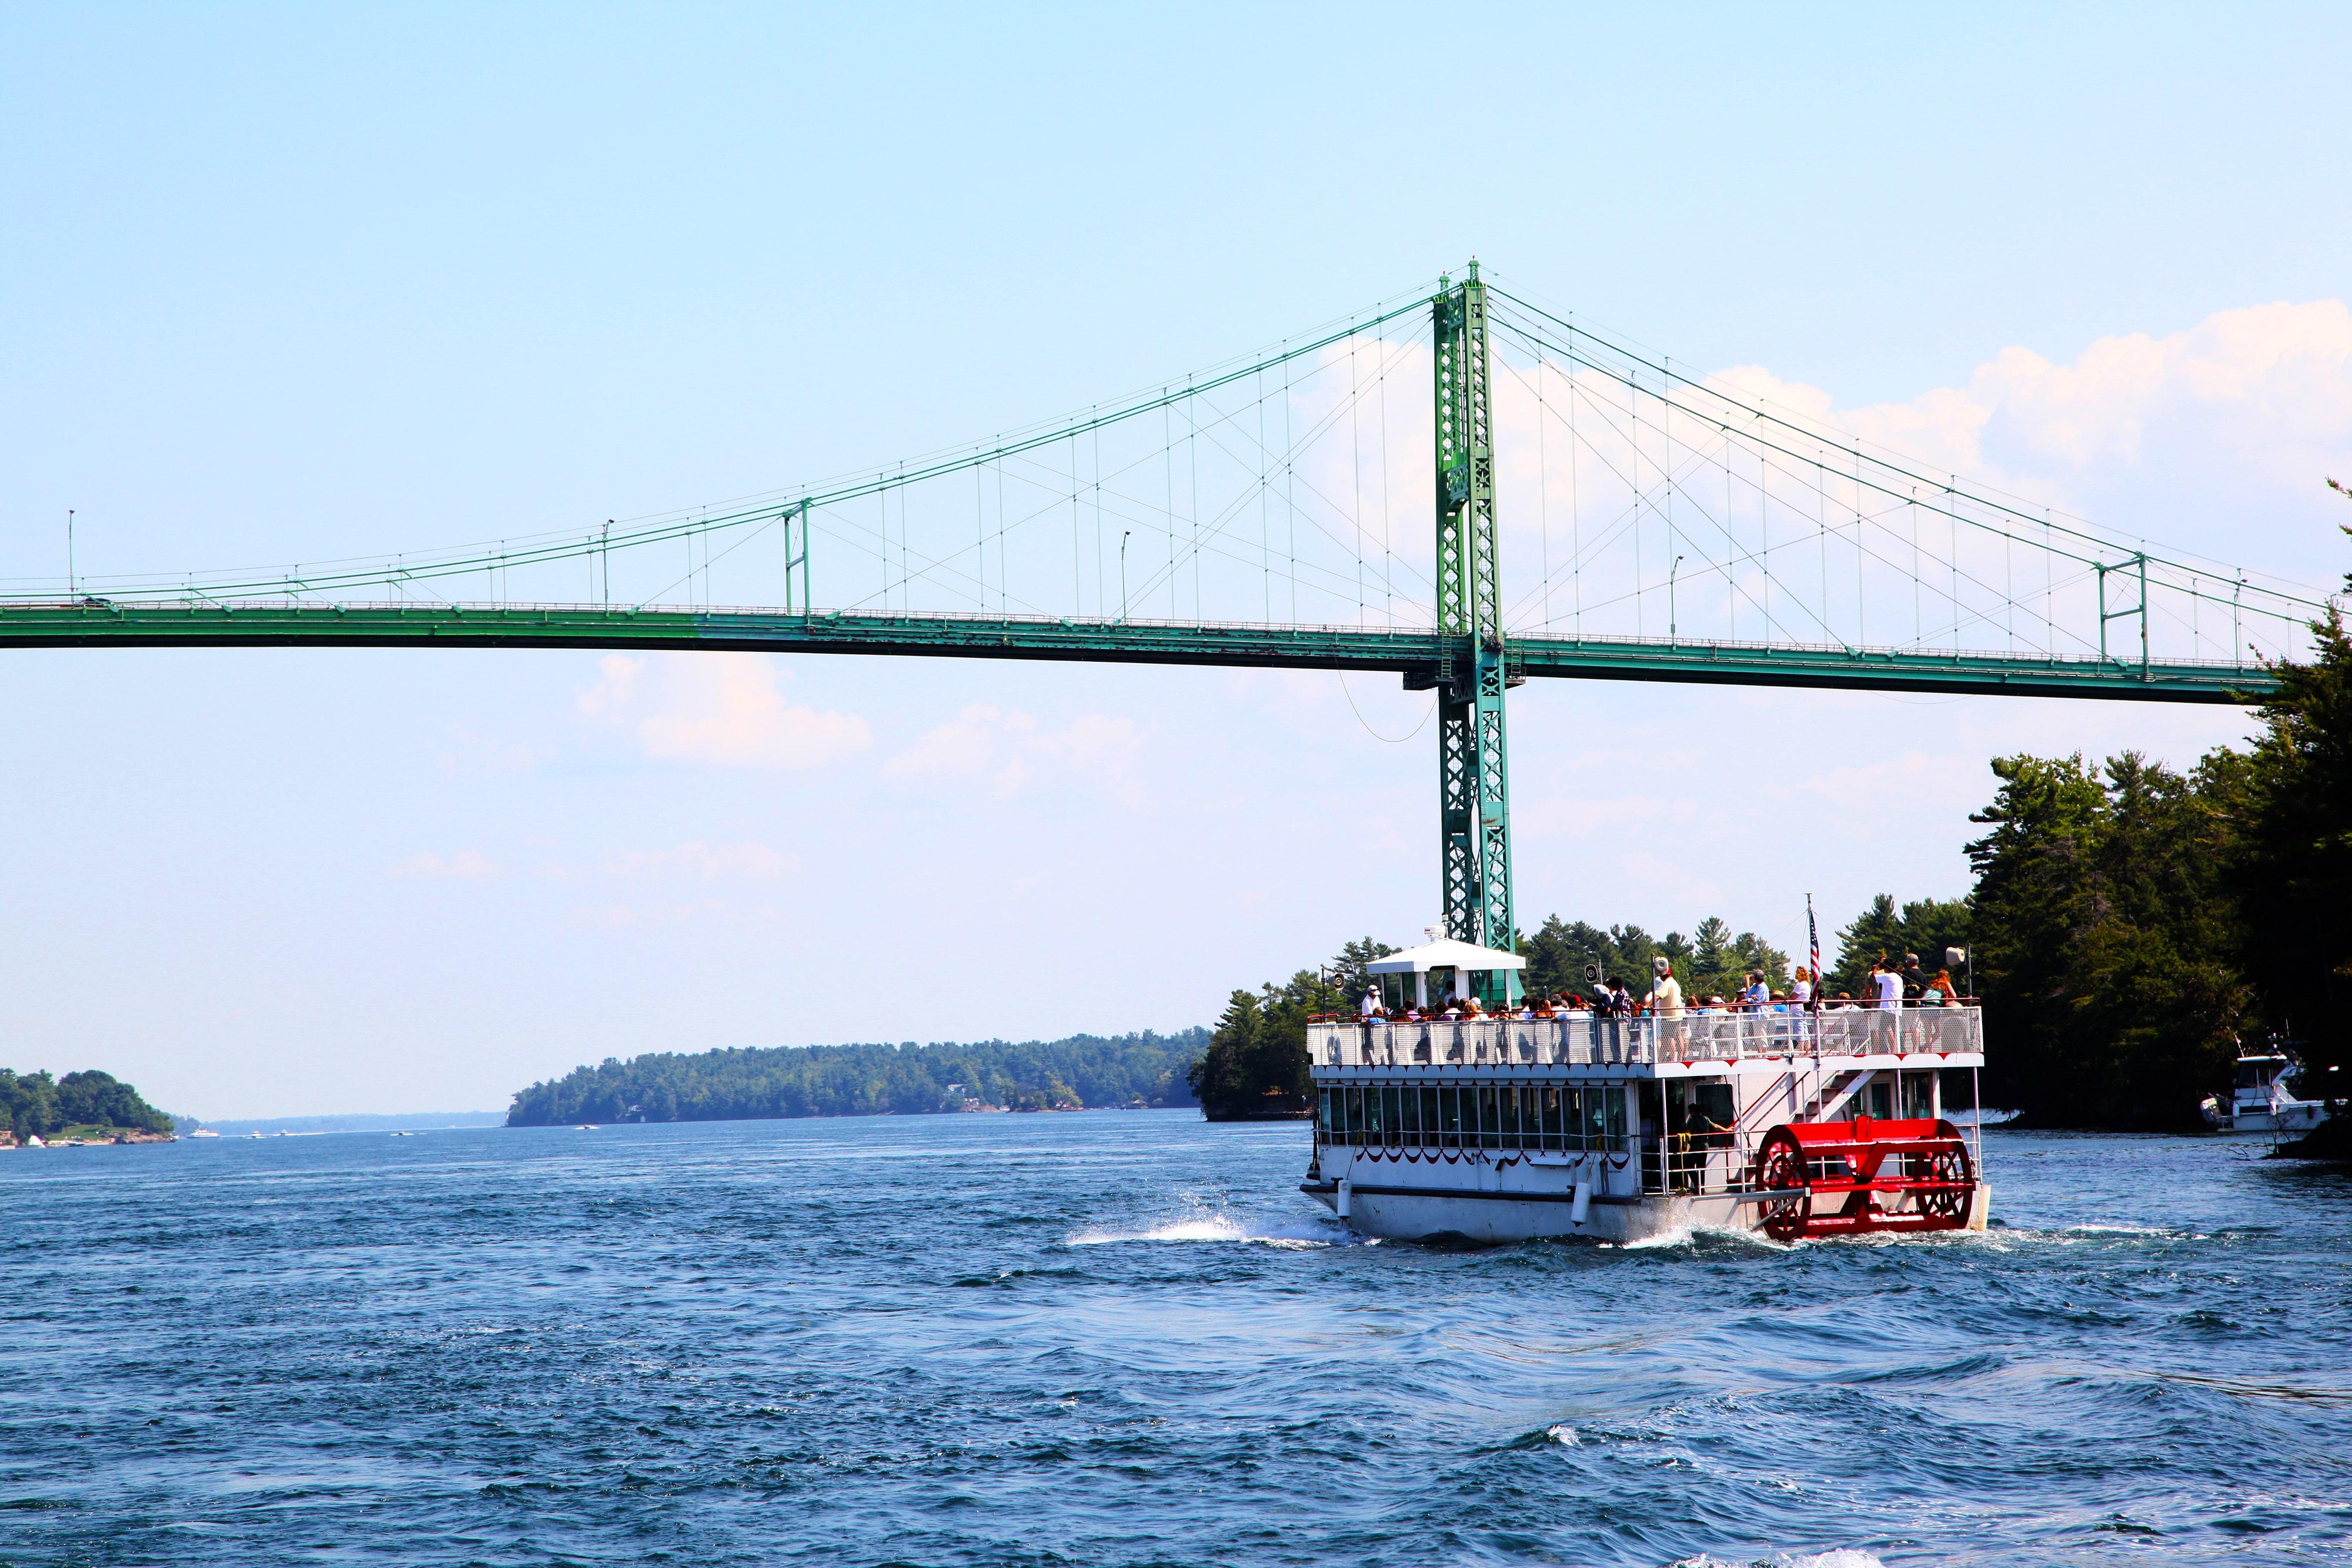 Tour boat passing under a scenic bridge